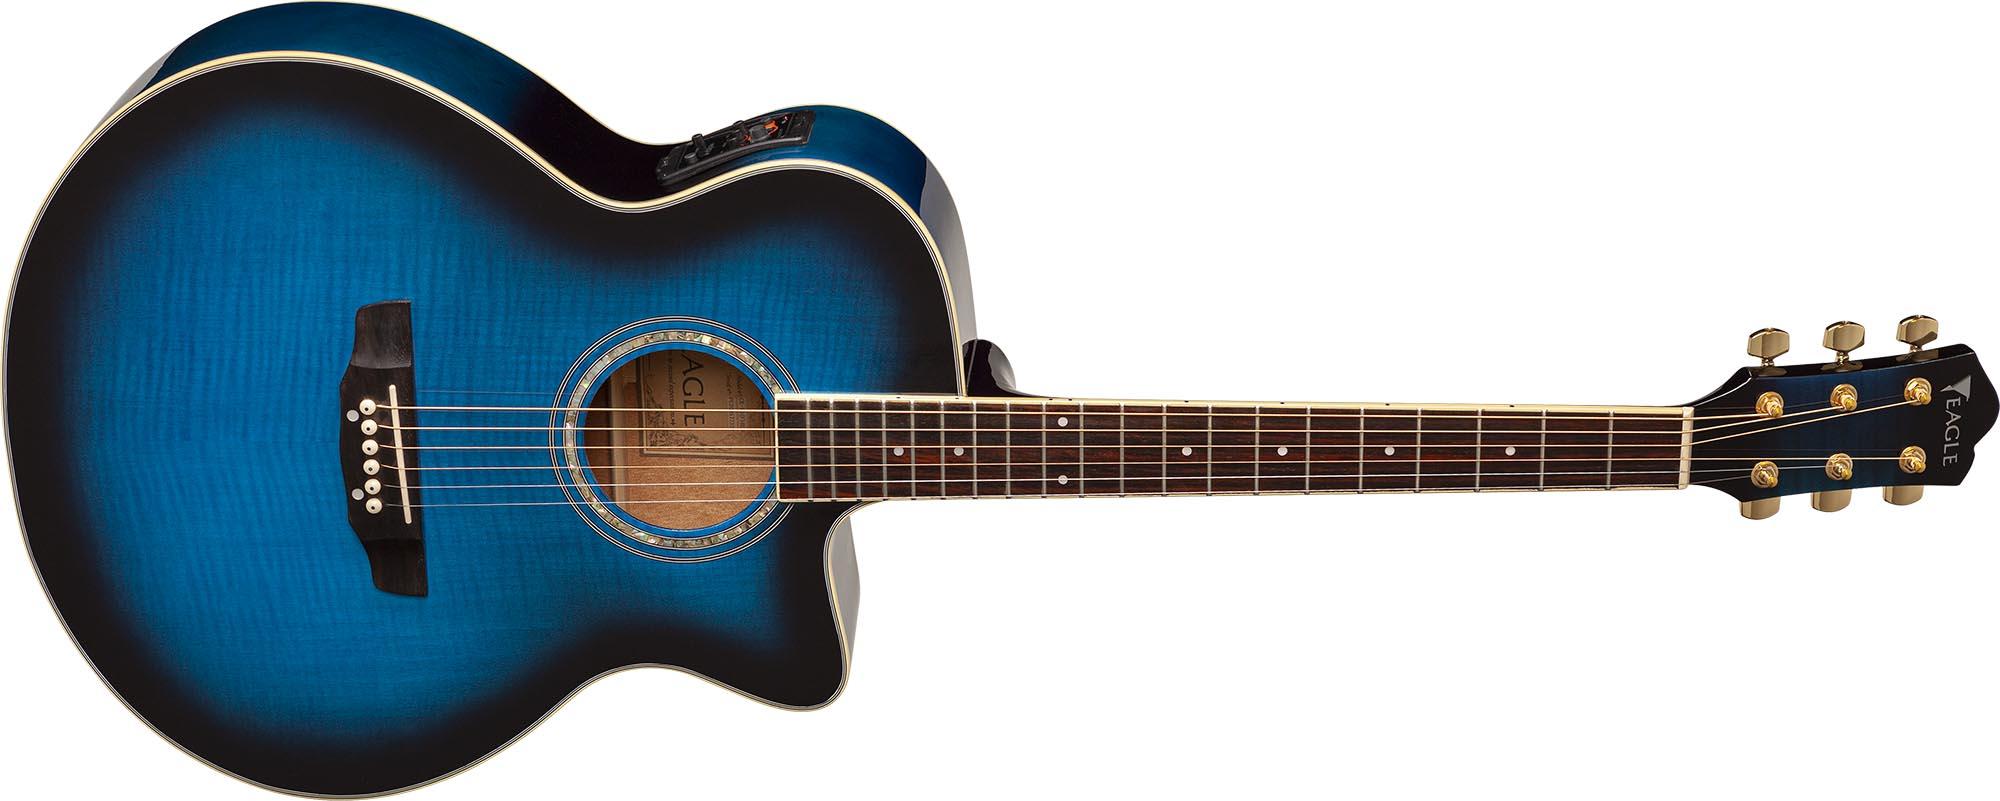 ch70f violao folk jumbo eagle pro series ch70f blb azul visao frontal